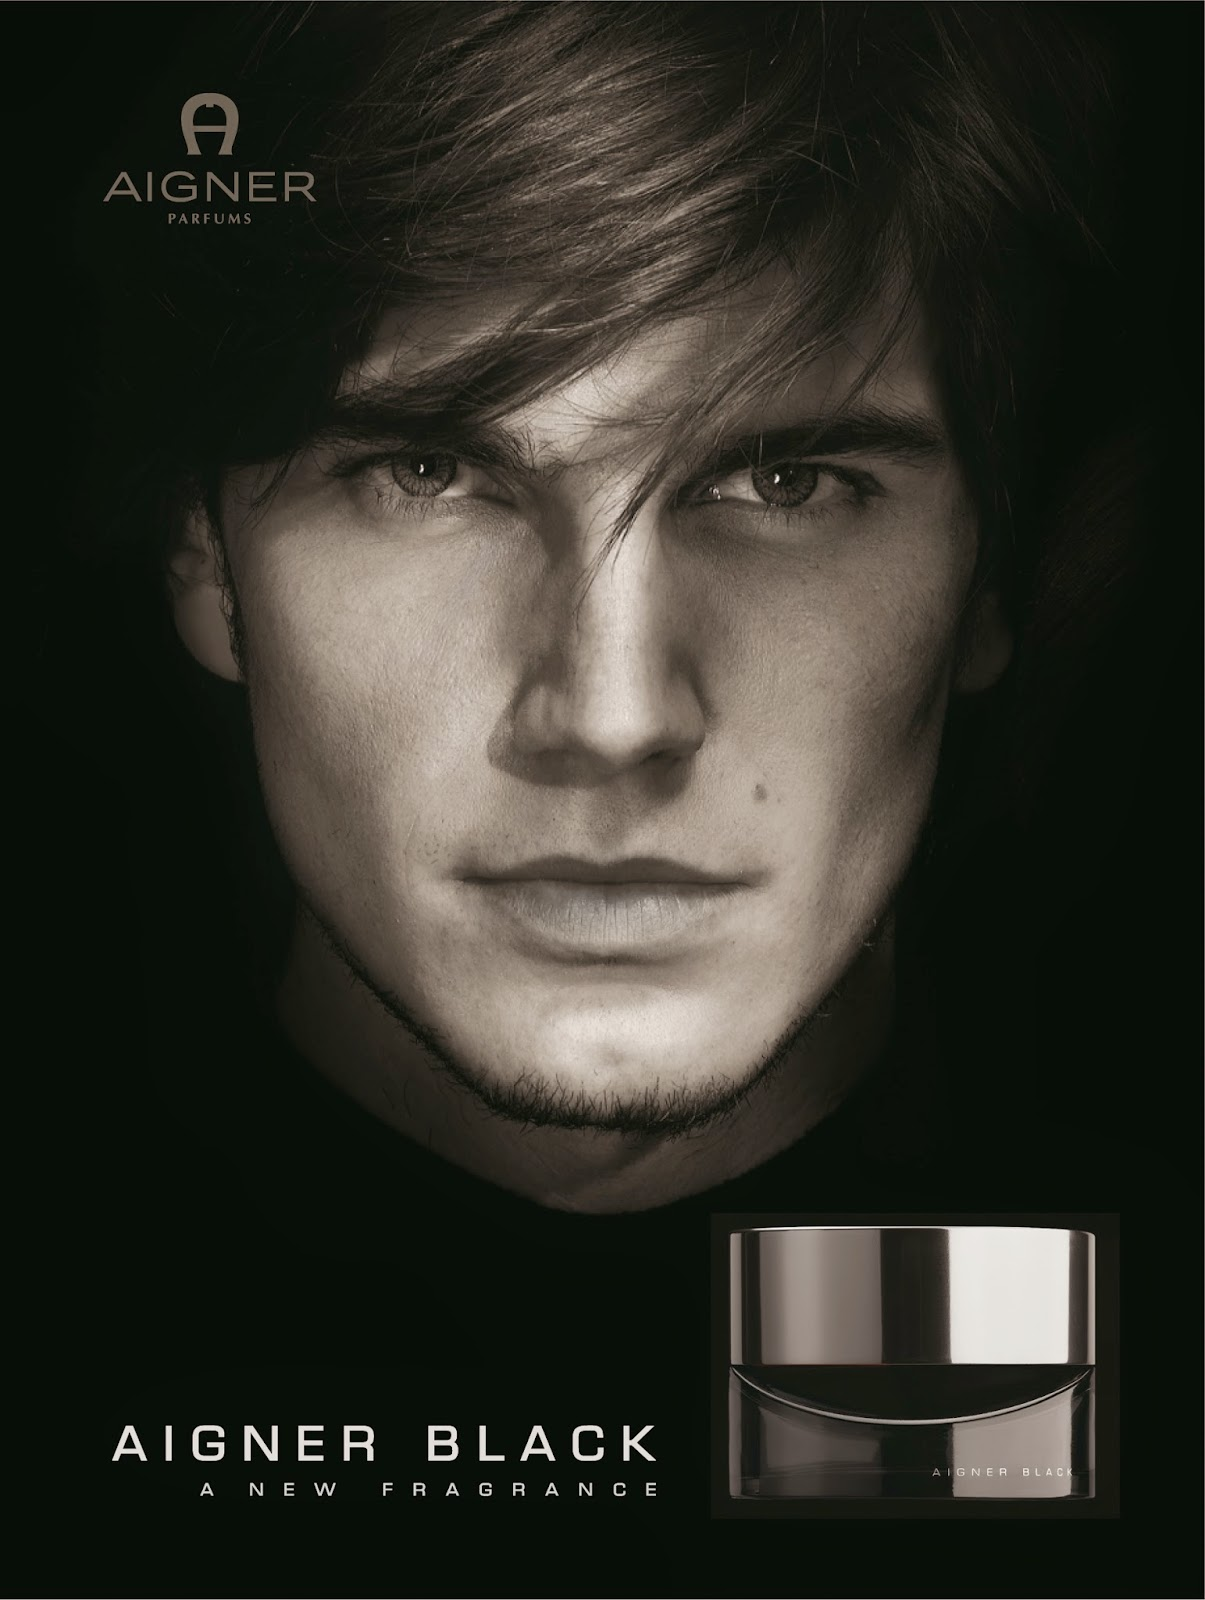 Aigner Black for Men by Etienne Aigner